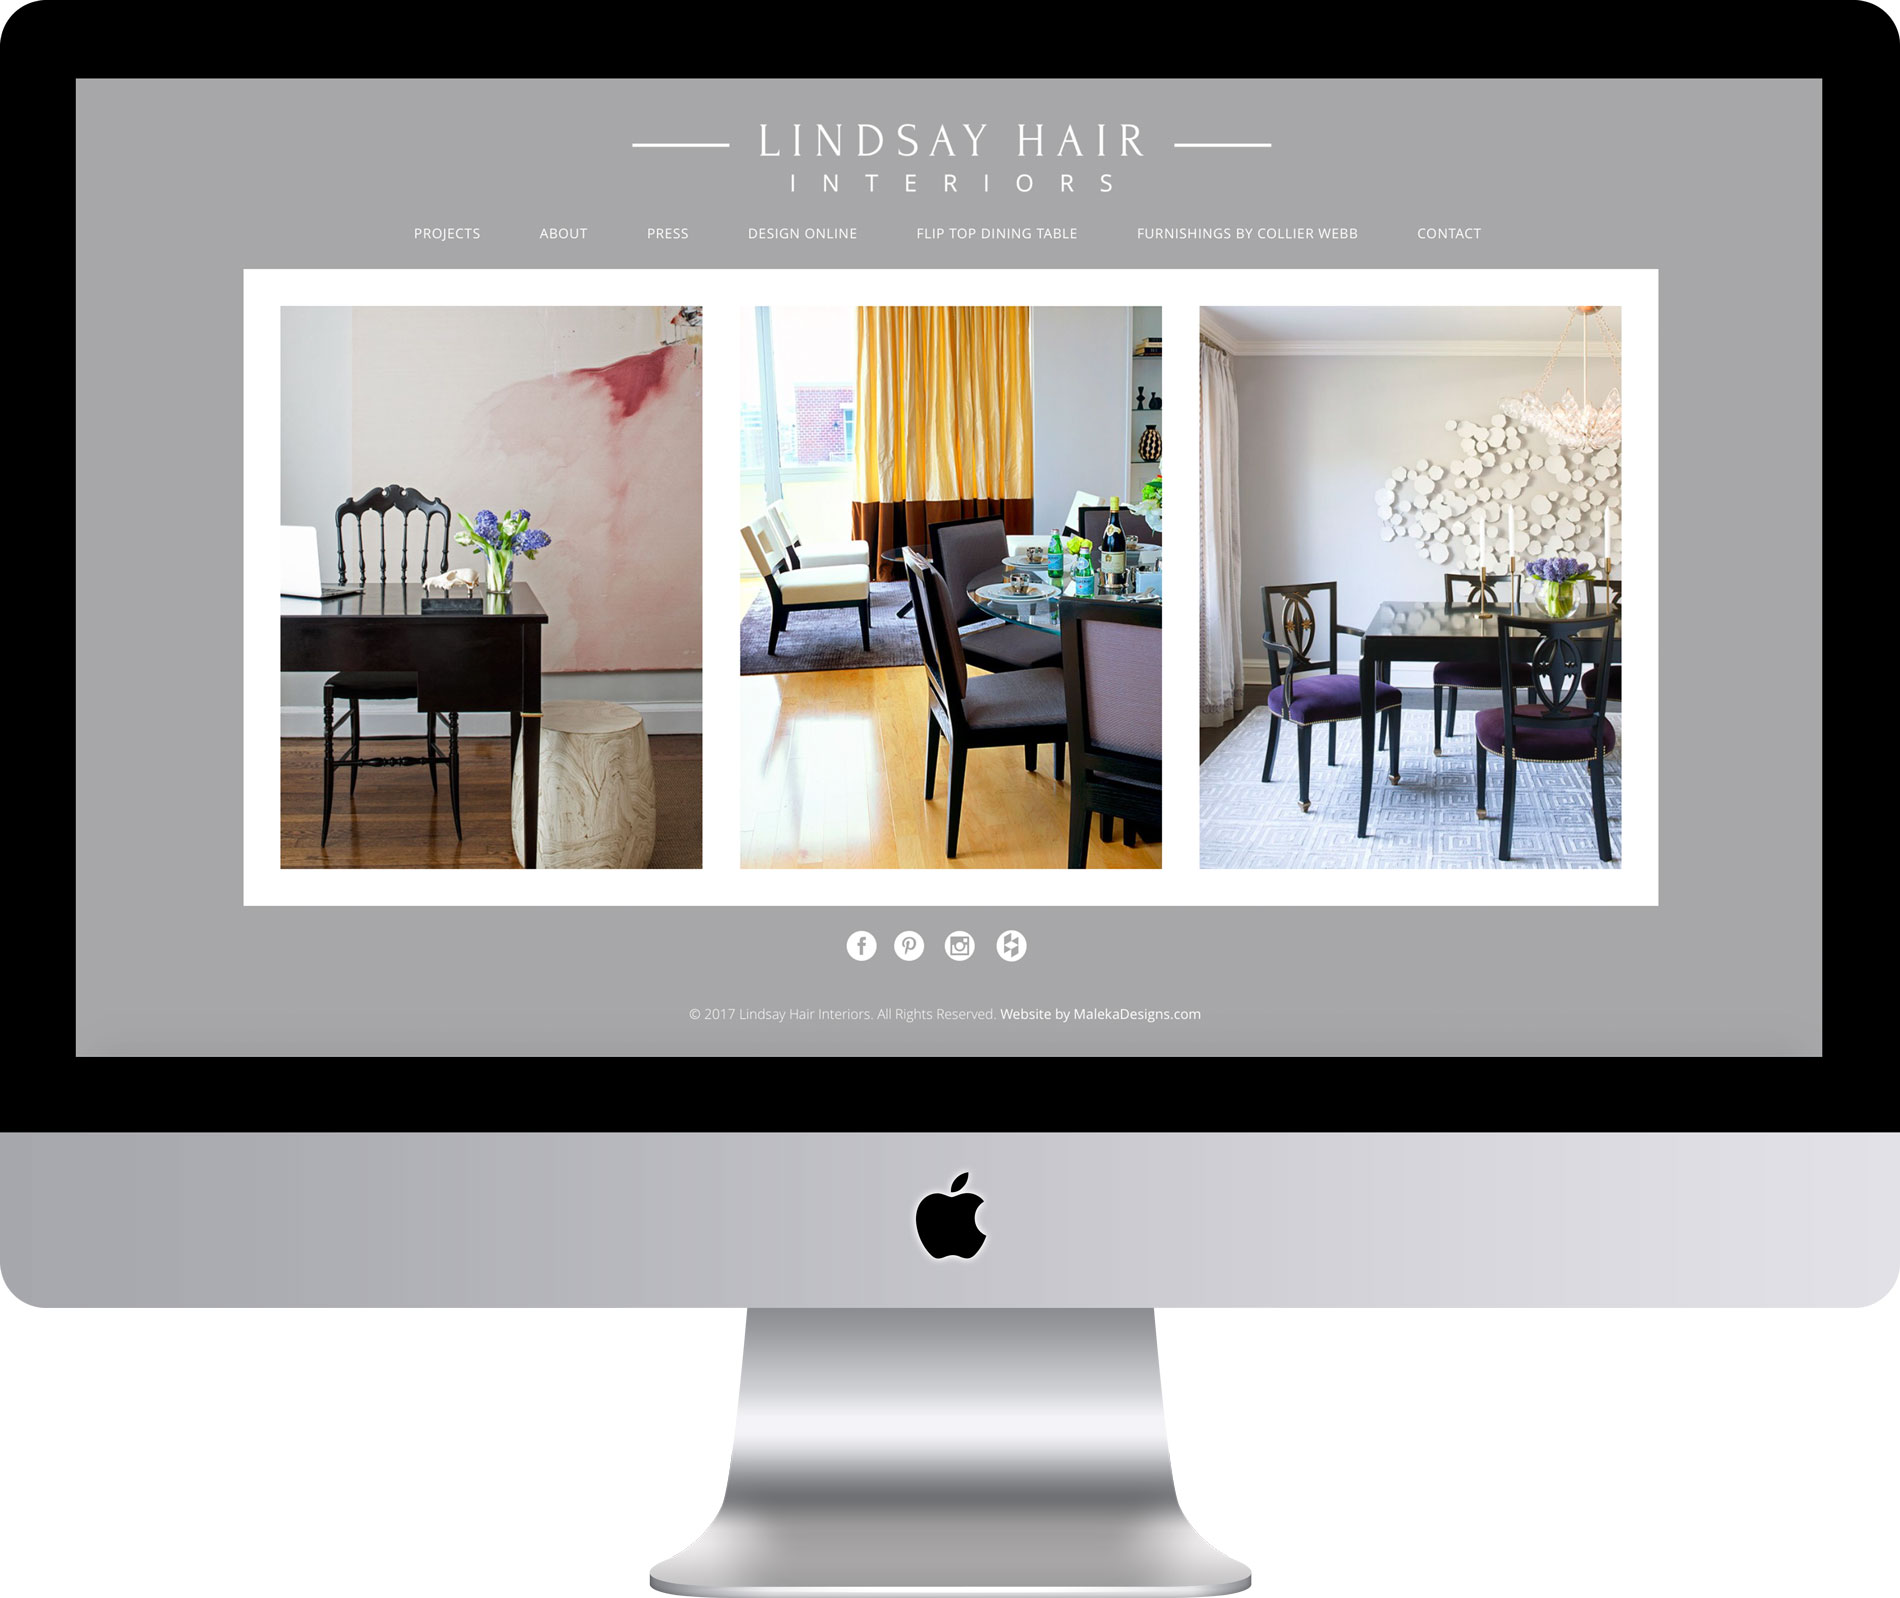 Lindsay Hair Interiors Website by Maleka Designs